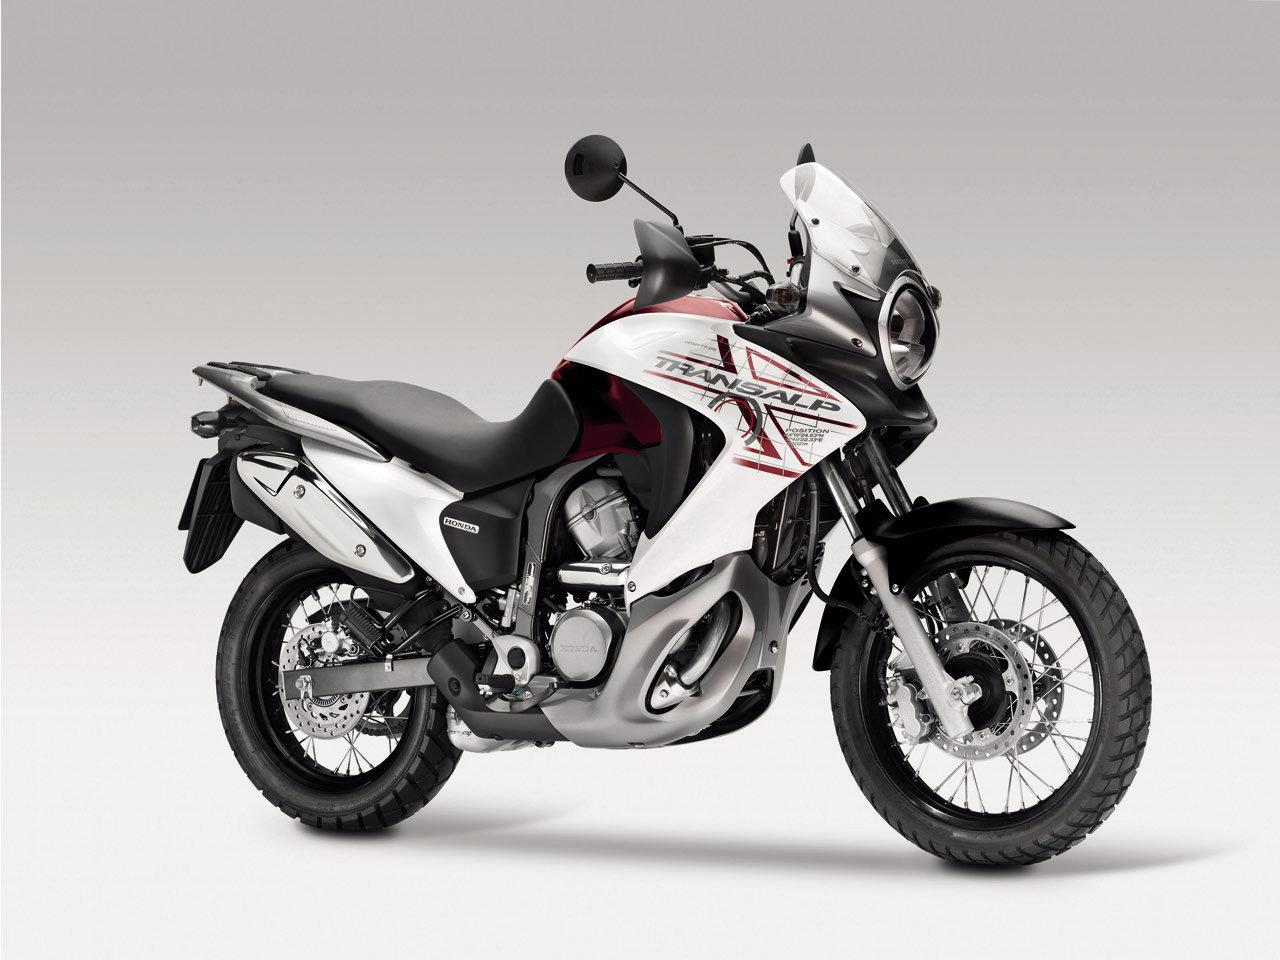 Listino Honda Integra 750 ABSS Scooter oltre 300 - image 14734_honda-transalpbase on http://moto.motori.net